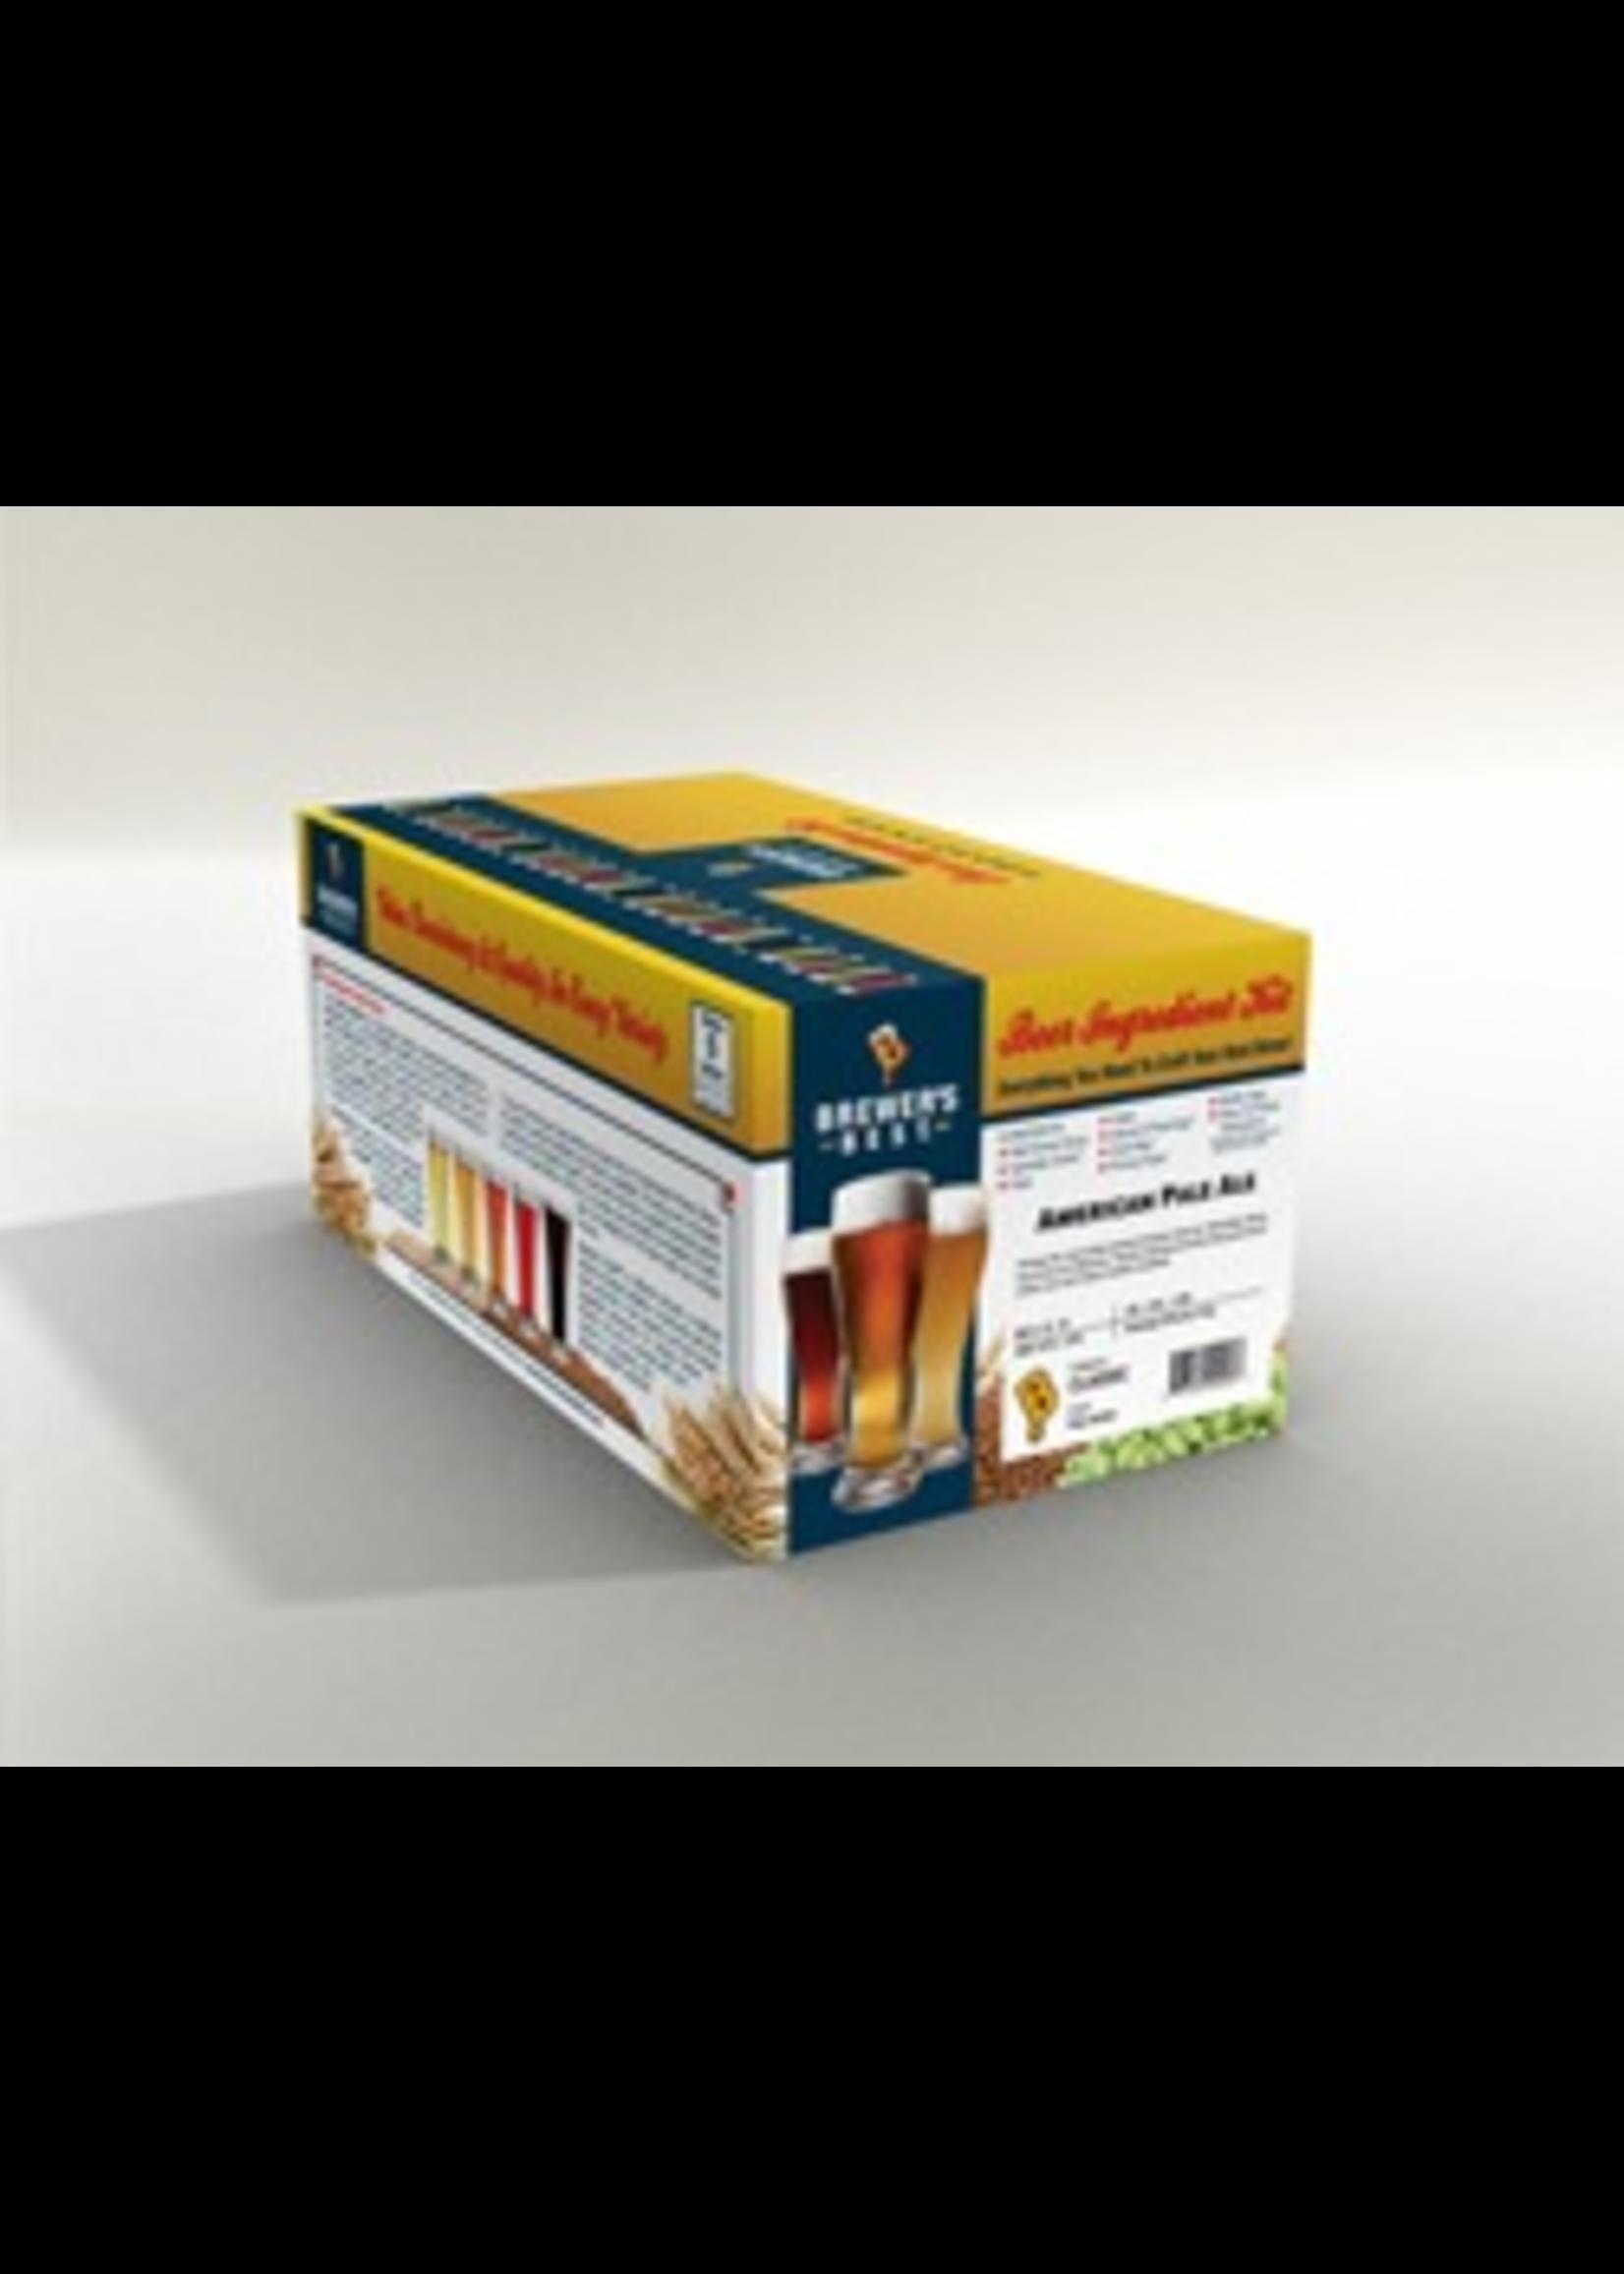 Ingredient Kits Brewer's Best English Pale Ale - 5 Gallon Beer Ingredient Kit